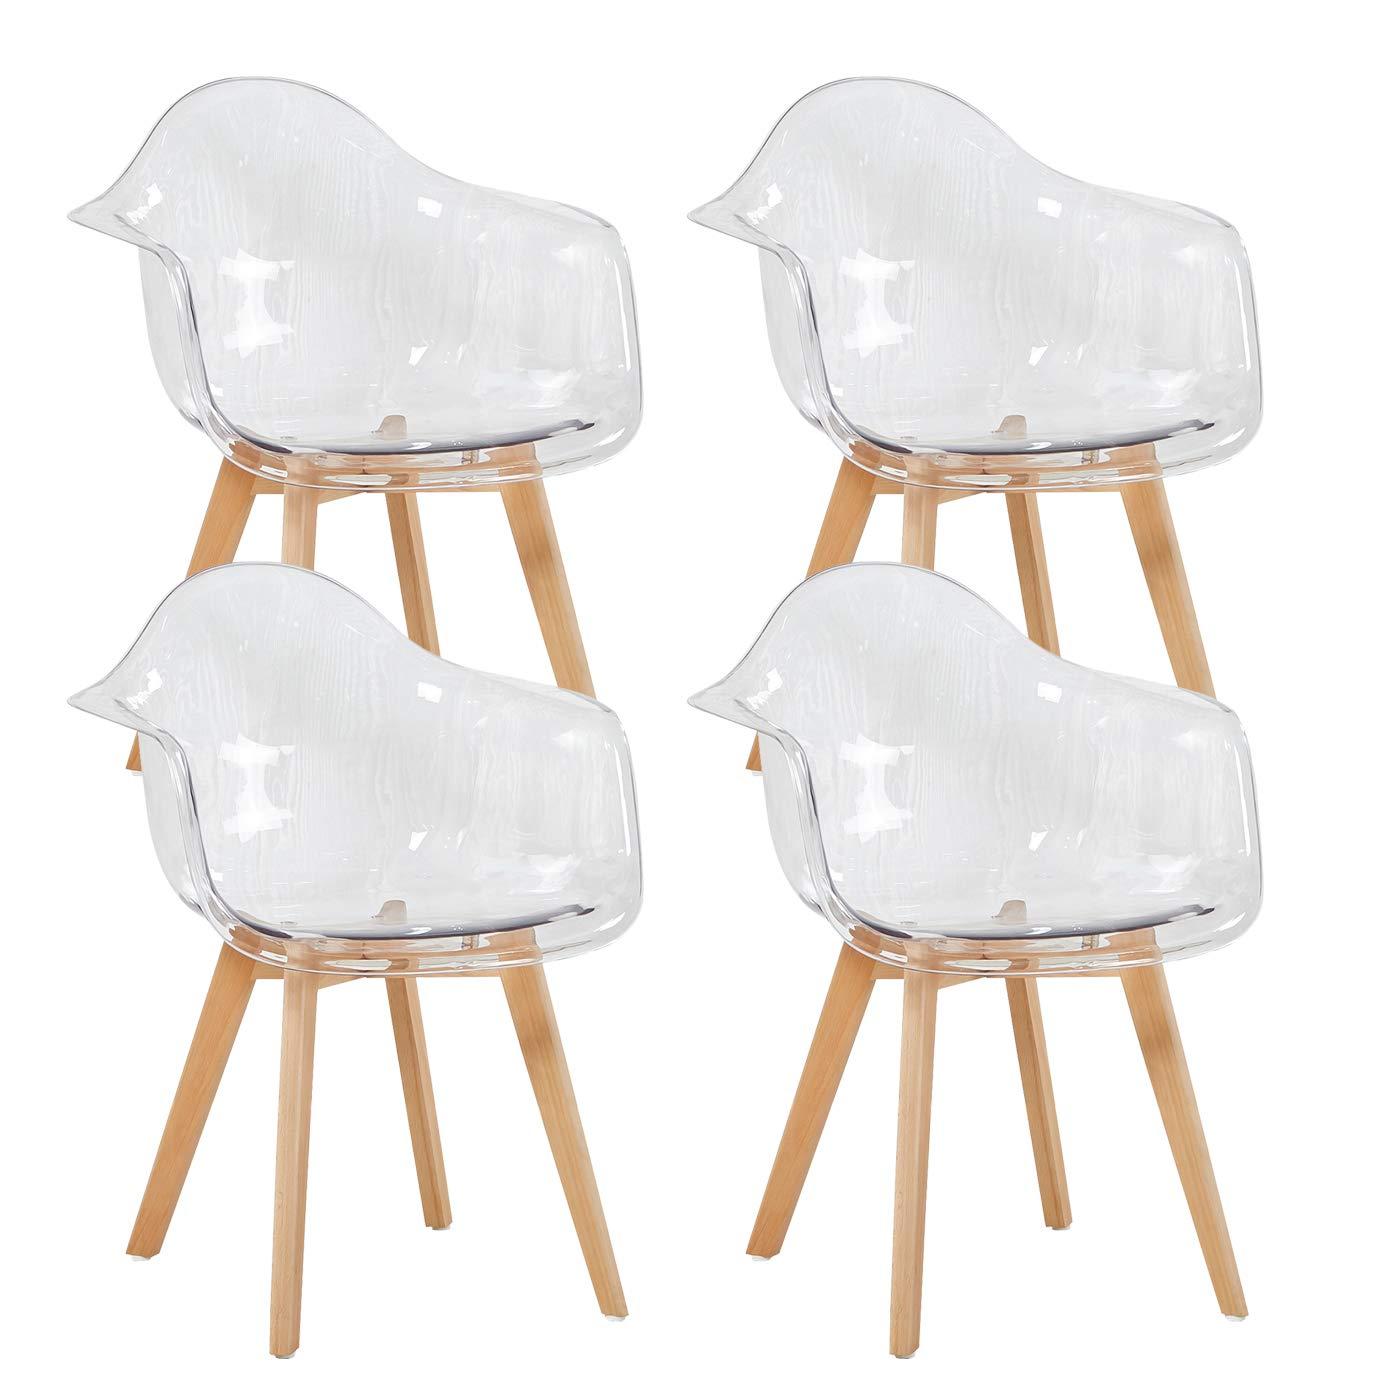 4er EGGREE 4er Set Transparent Sessel Skandinavisch Esszimmerstuhl Modern Wohnzimmerstuhl